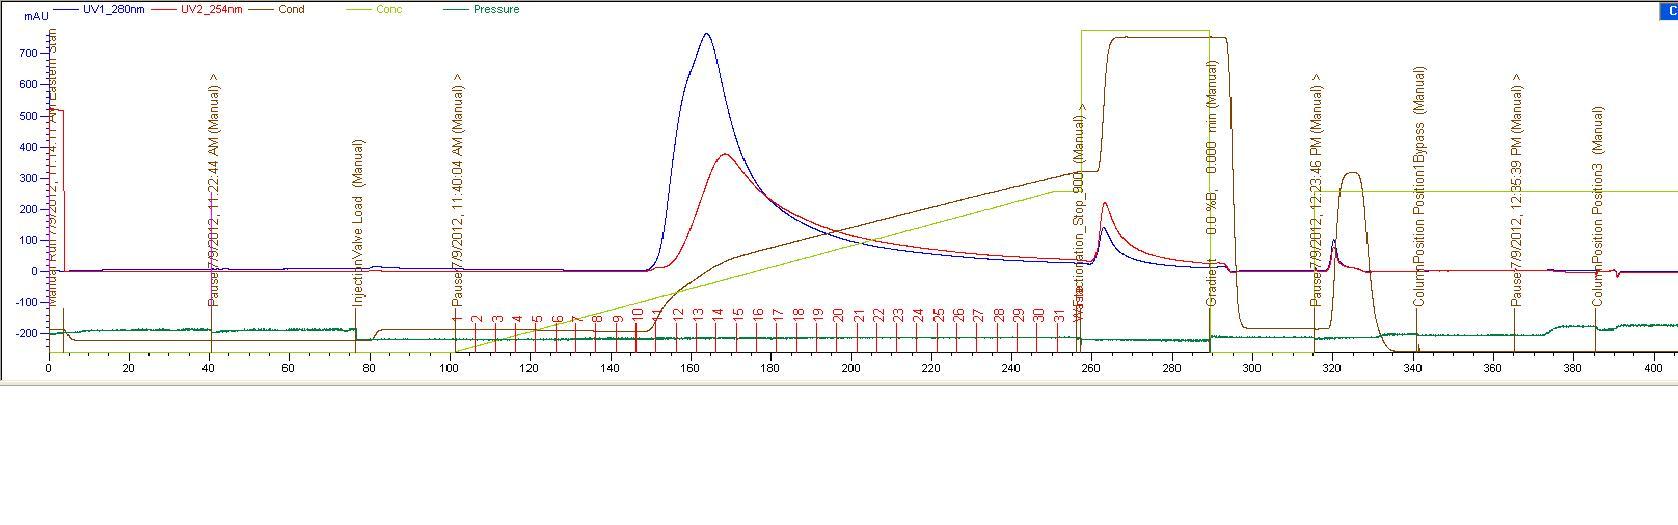 Purification graph 070912.JPG